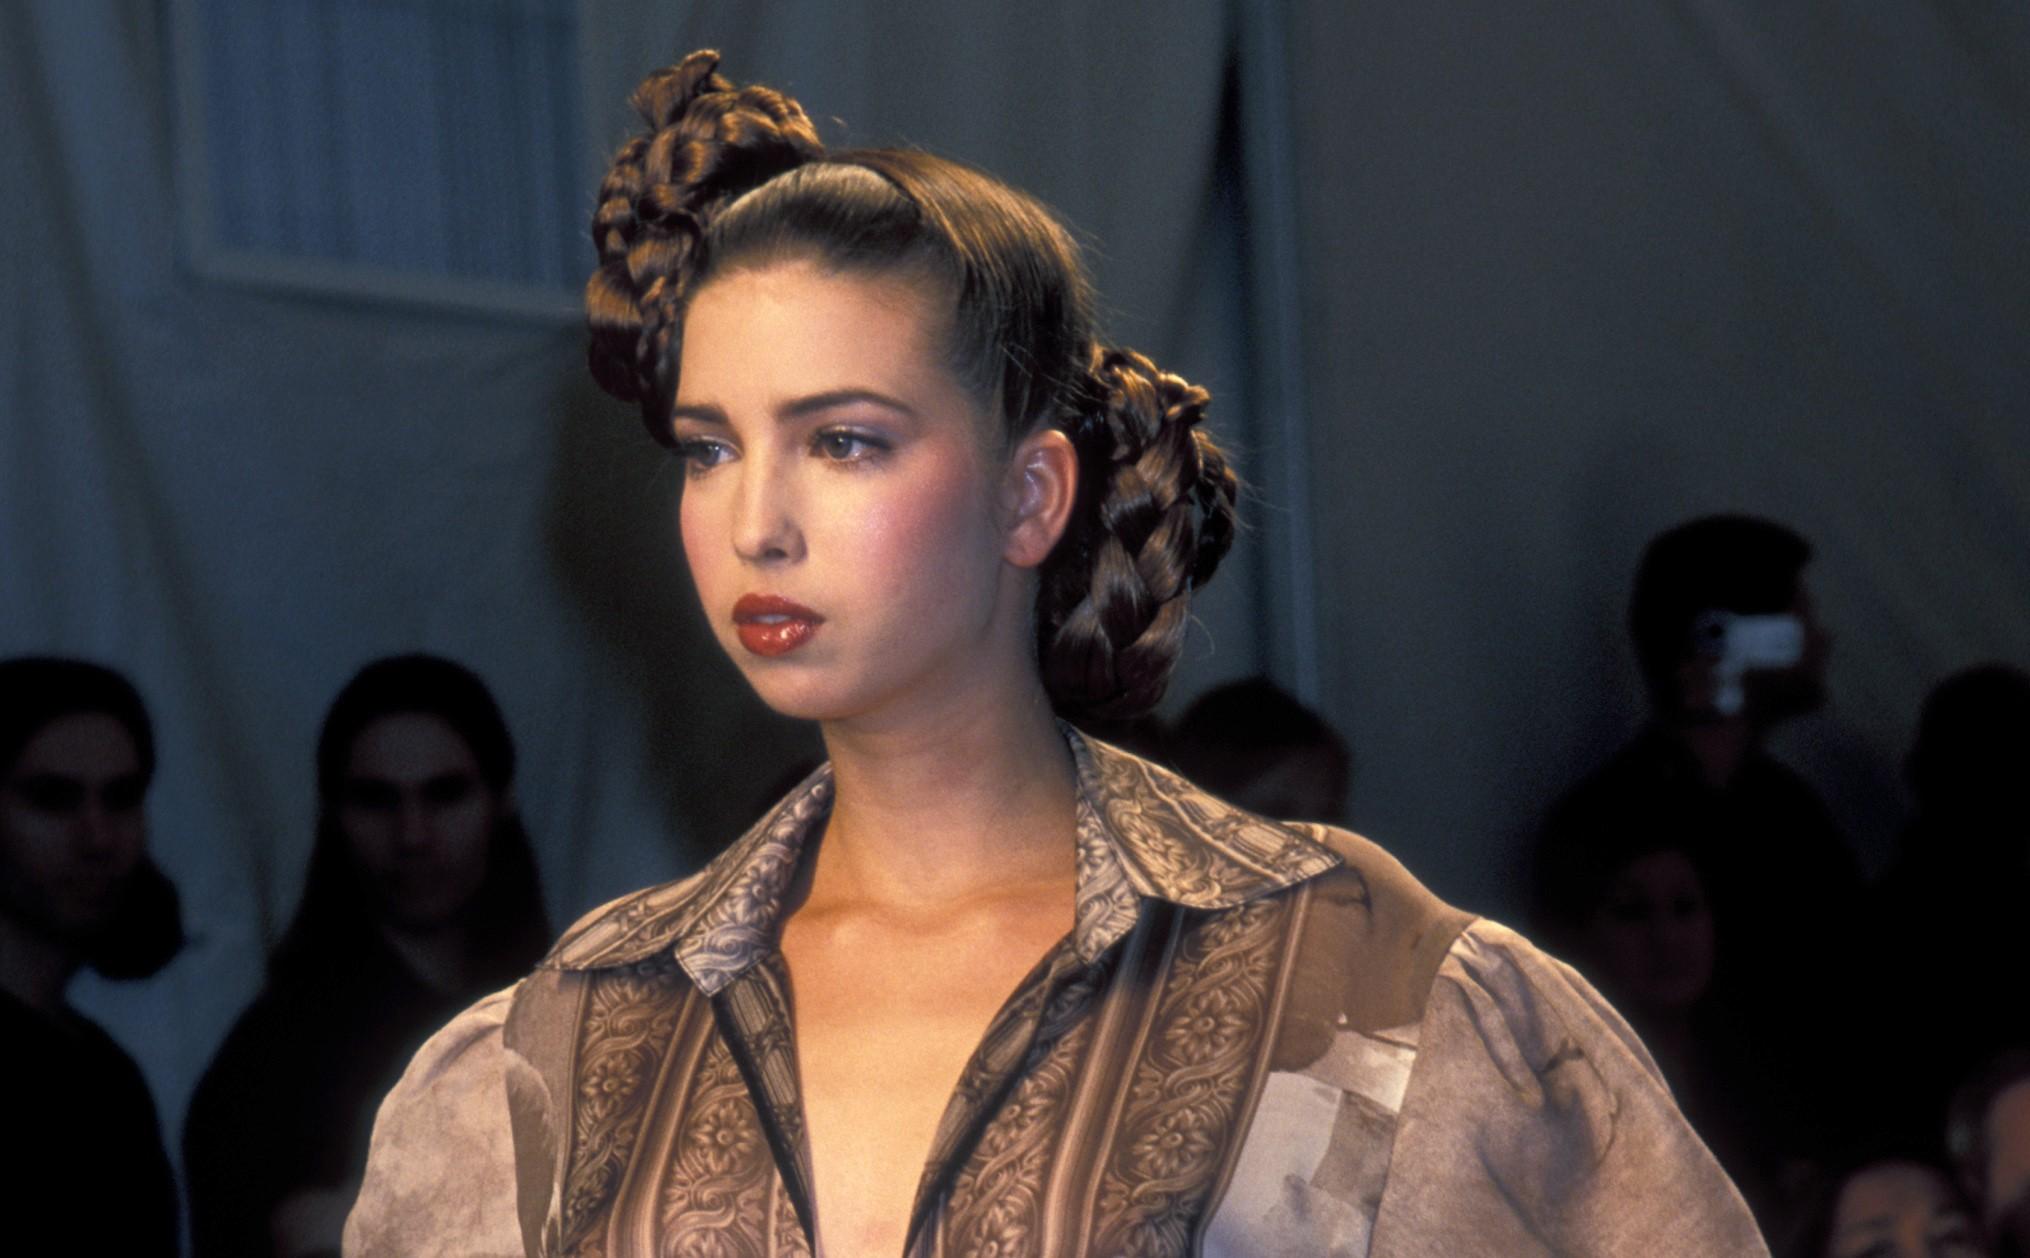 Zang Toi Fashion Show - Septembre 13, 1999